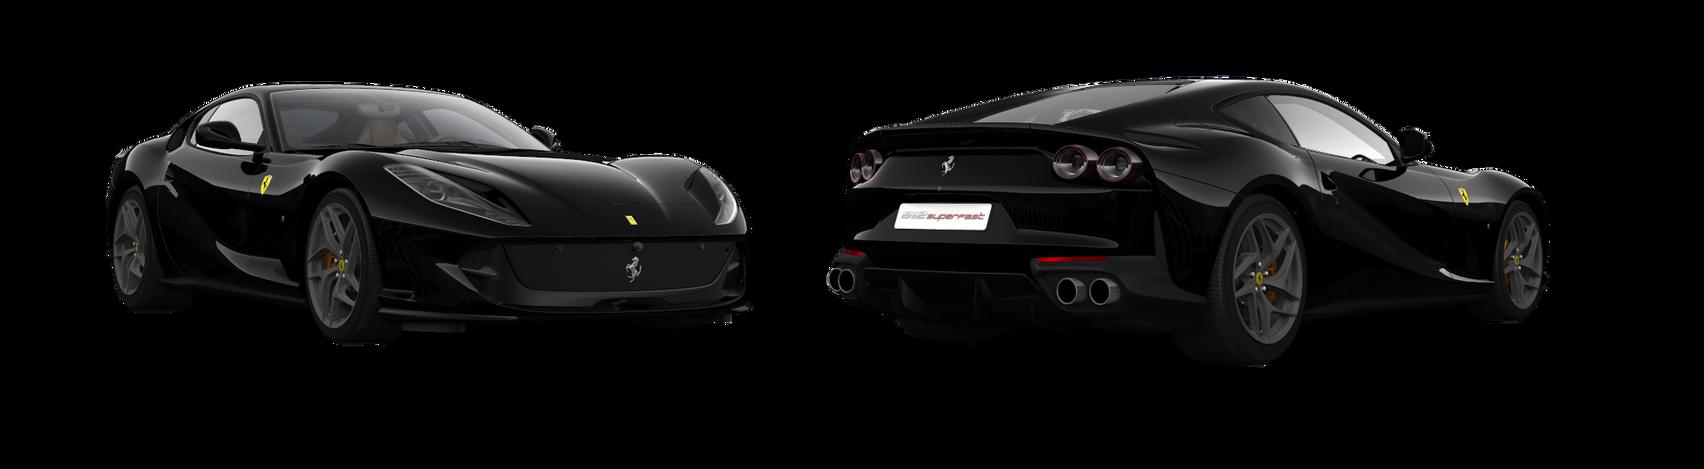 812 Superfast by FerrariF12Berlinetta